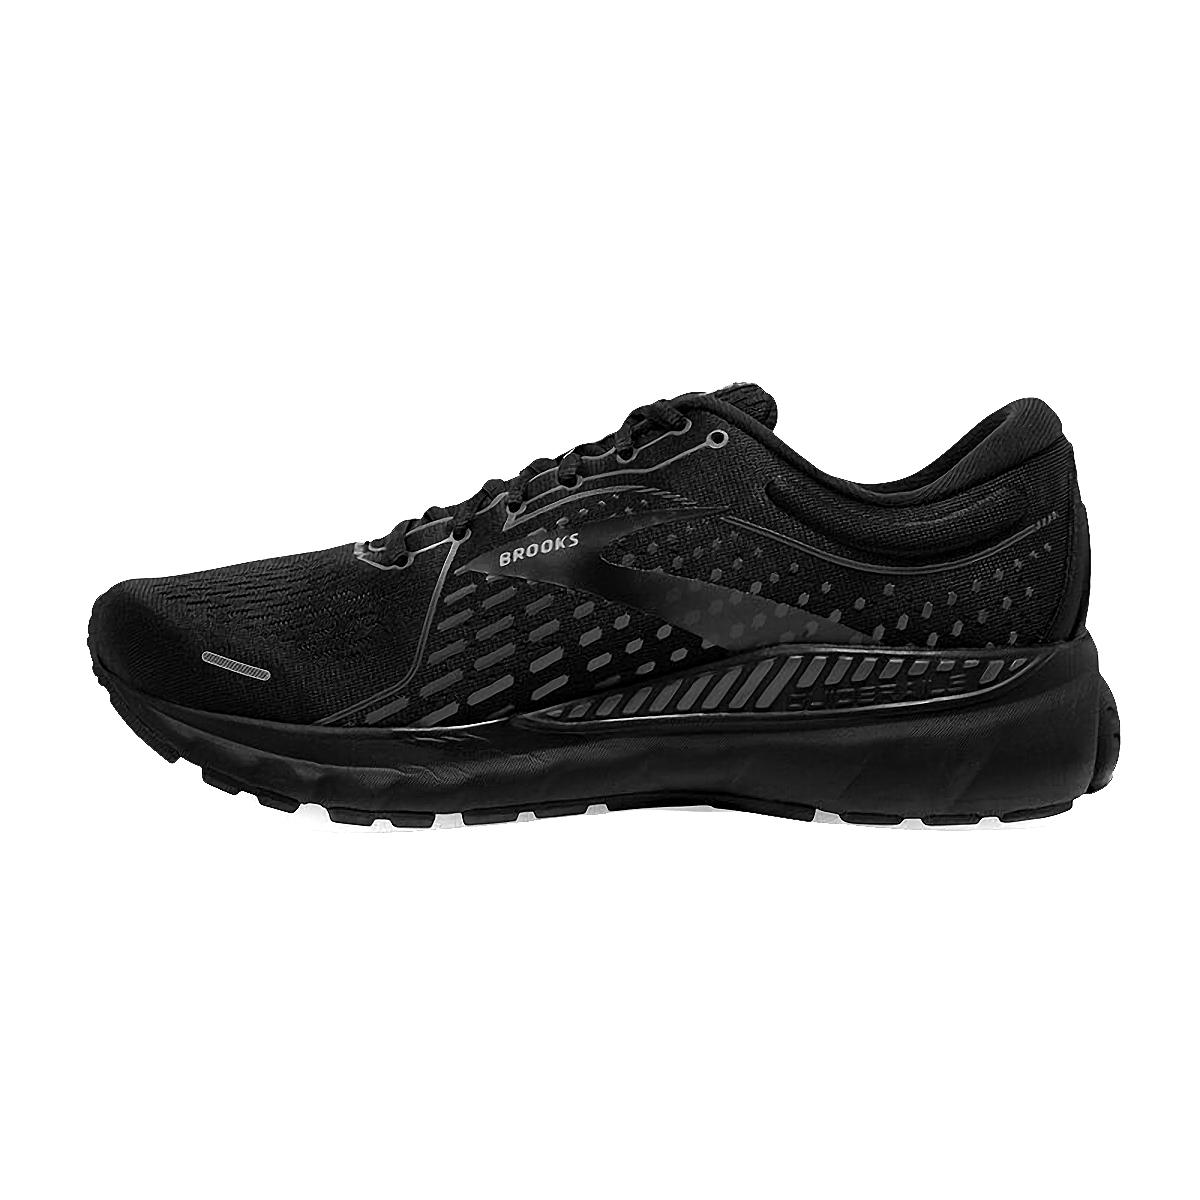 Men's Brooks Adrenaline GTS 21 Running Shoe - Color: Black/Black/Ebony - Size: 7 - Width: Regular, Black/Black/Ebony, large, image 2